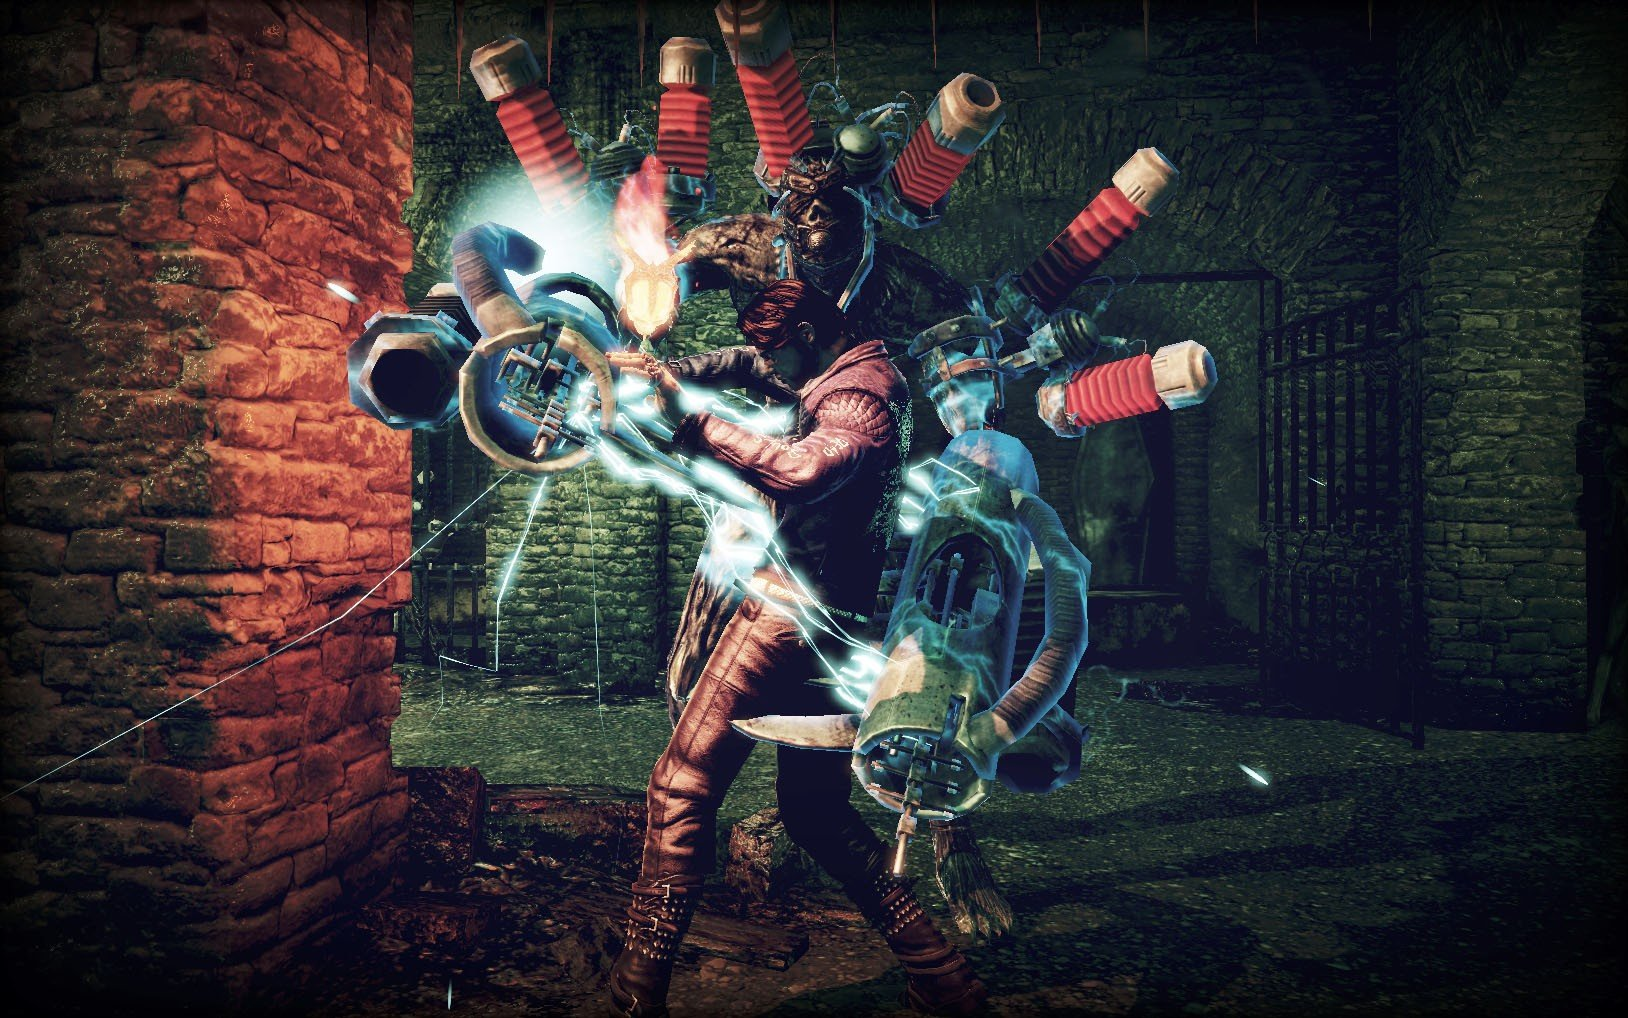 Shadows Of The Damned Mini-Game And Demon Blasting Screenshots #17883